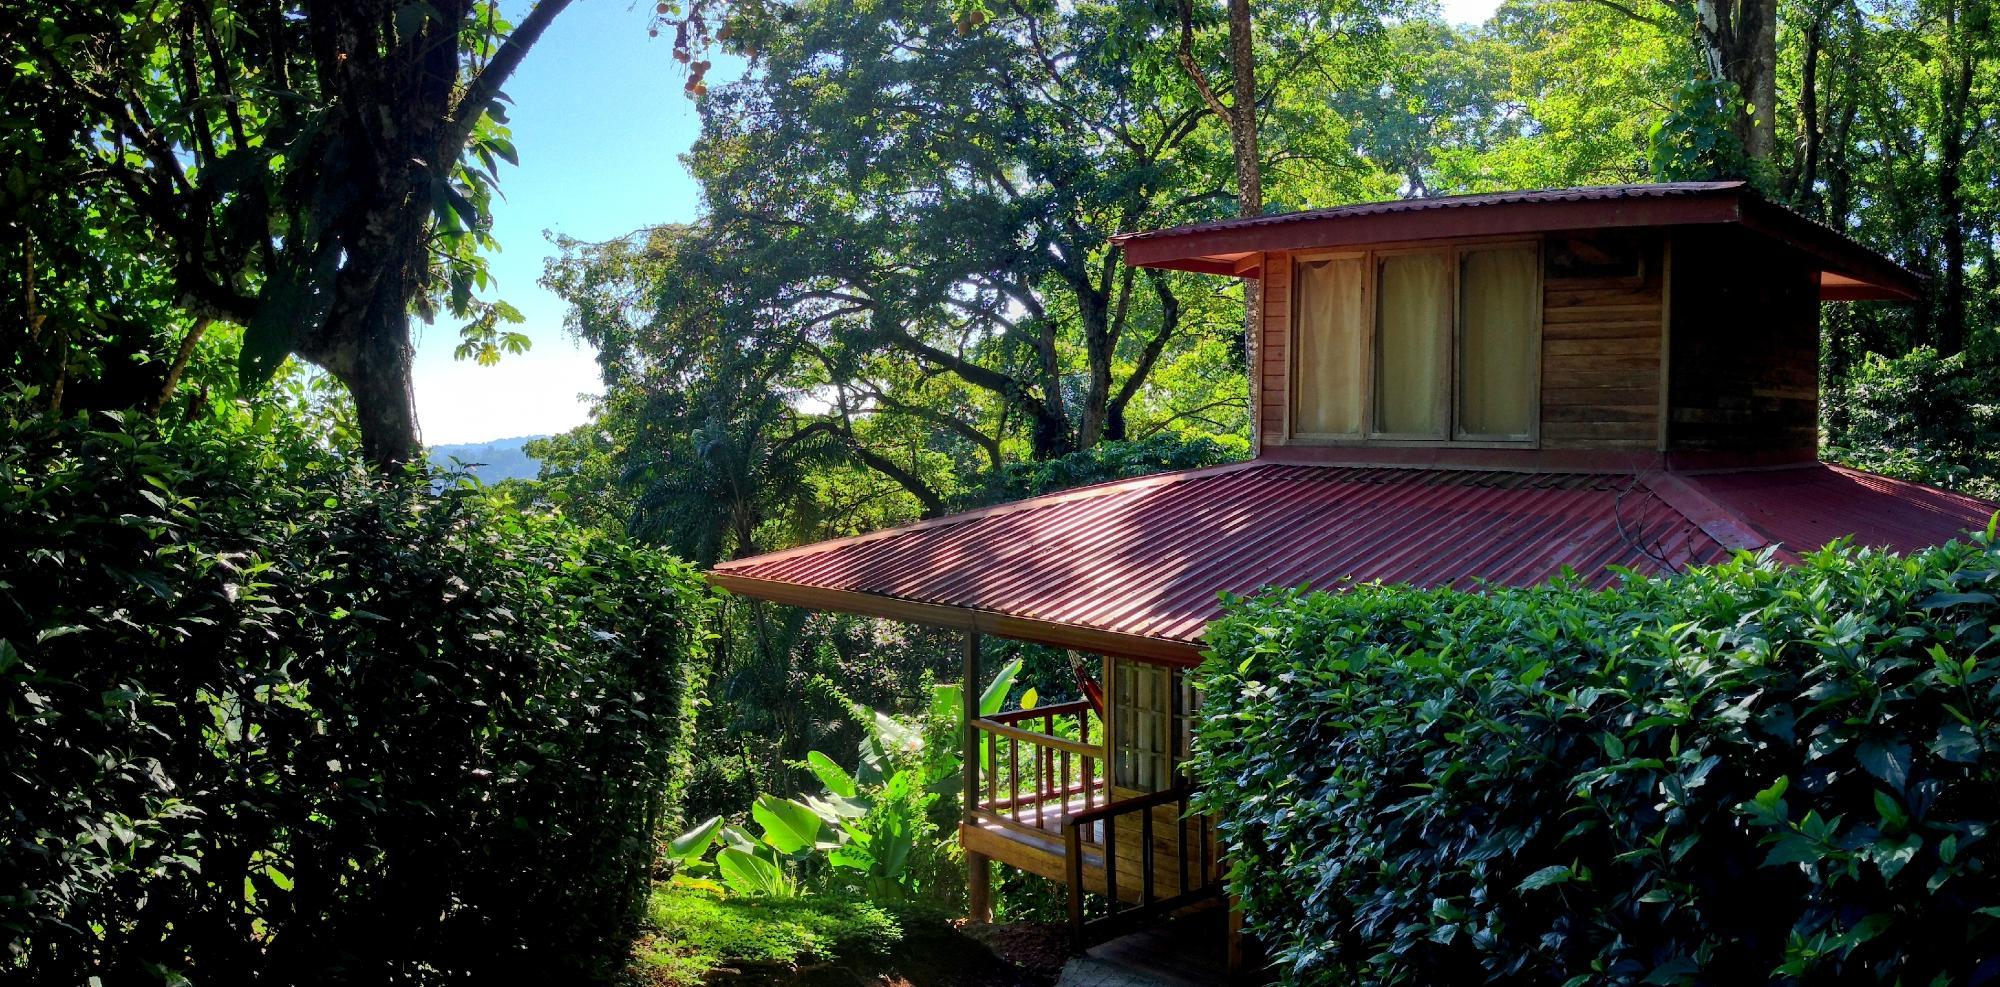 Samasati Retreat & Rainforest Sanctuary